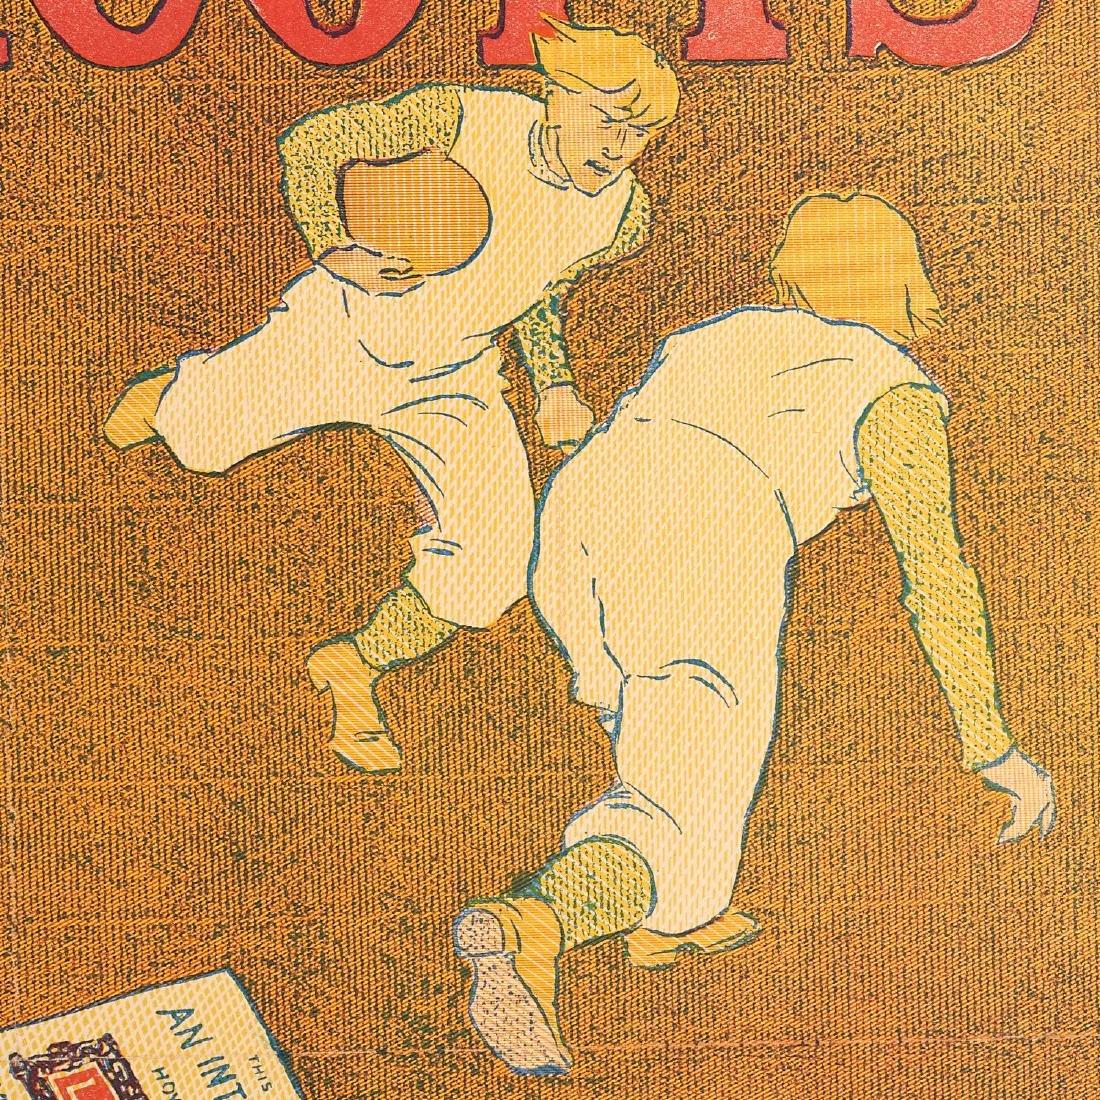 J. J. Gould Jr., poster - 2